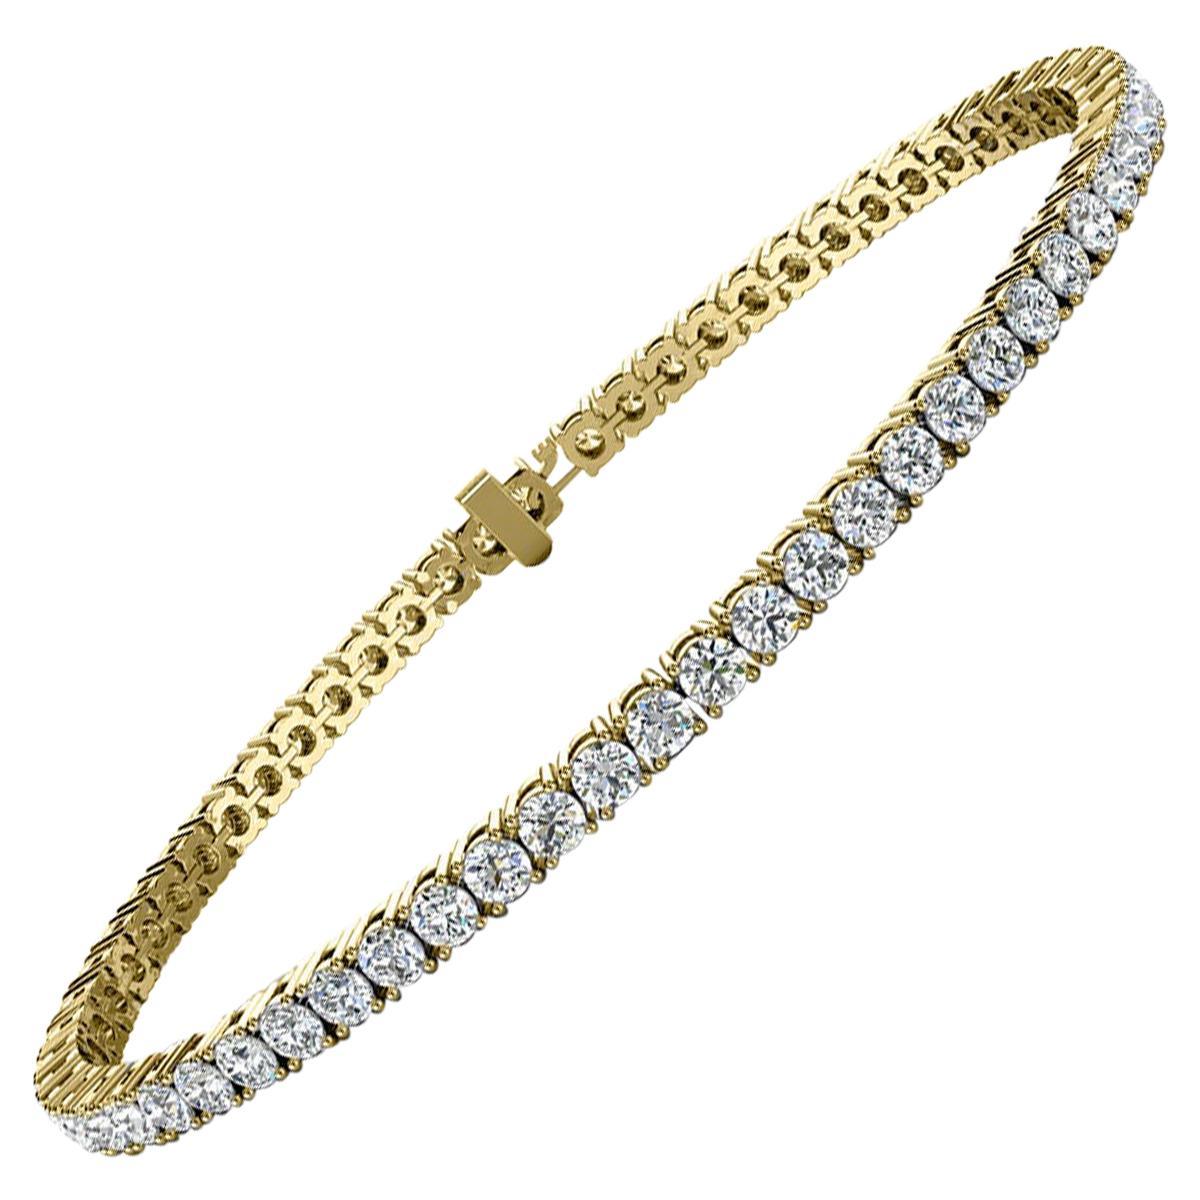 14 Karat Yellow Gold Four Prongs Diamond Tennis Bracelet '4 Carat'